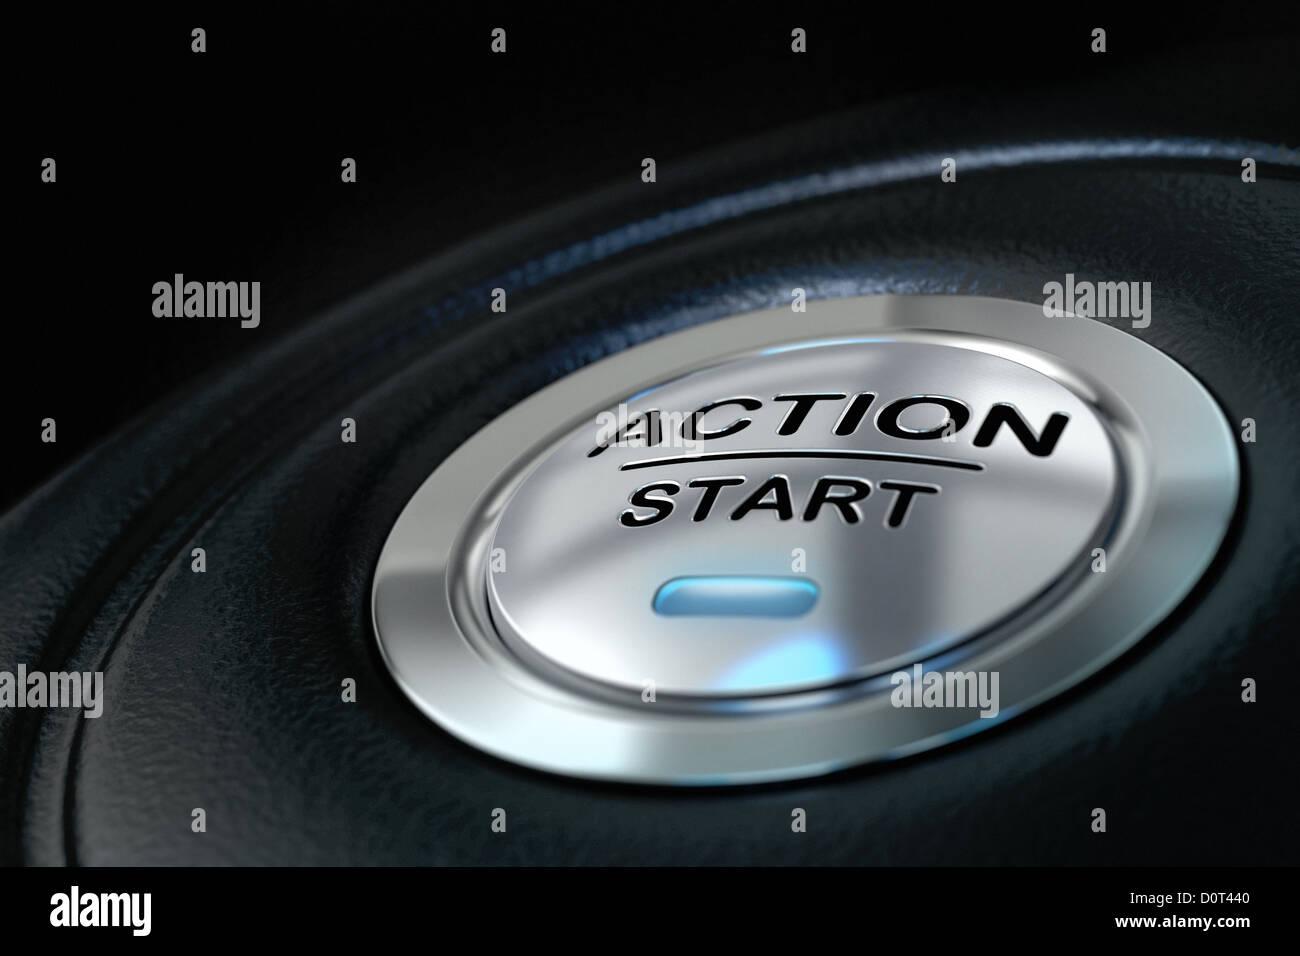 pushed action start button over black background, blue light, motivation concept - Stock Image